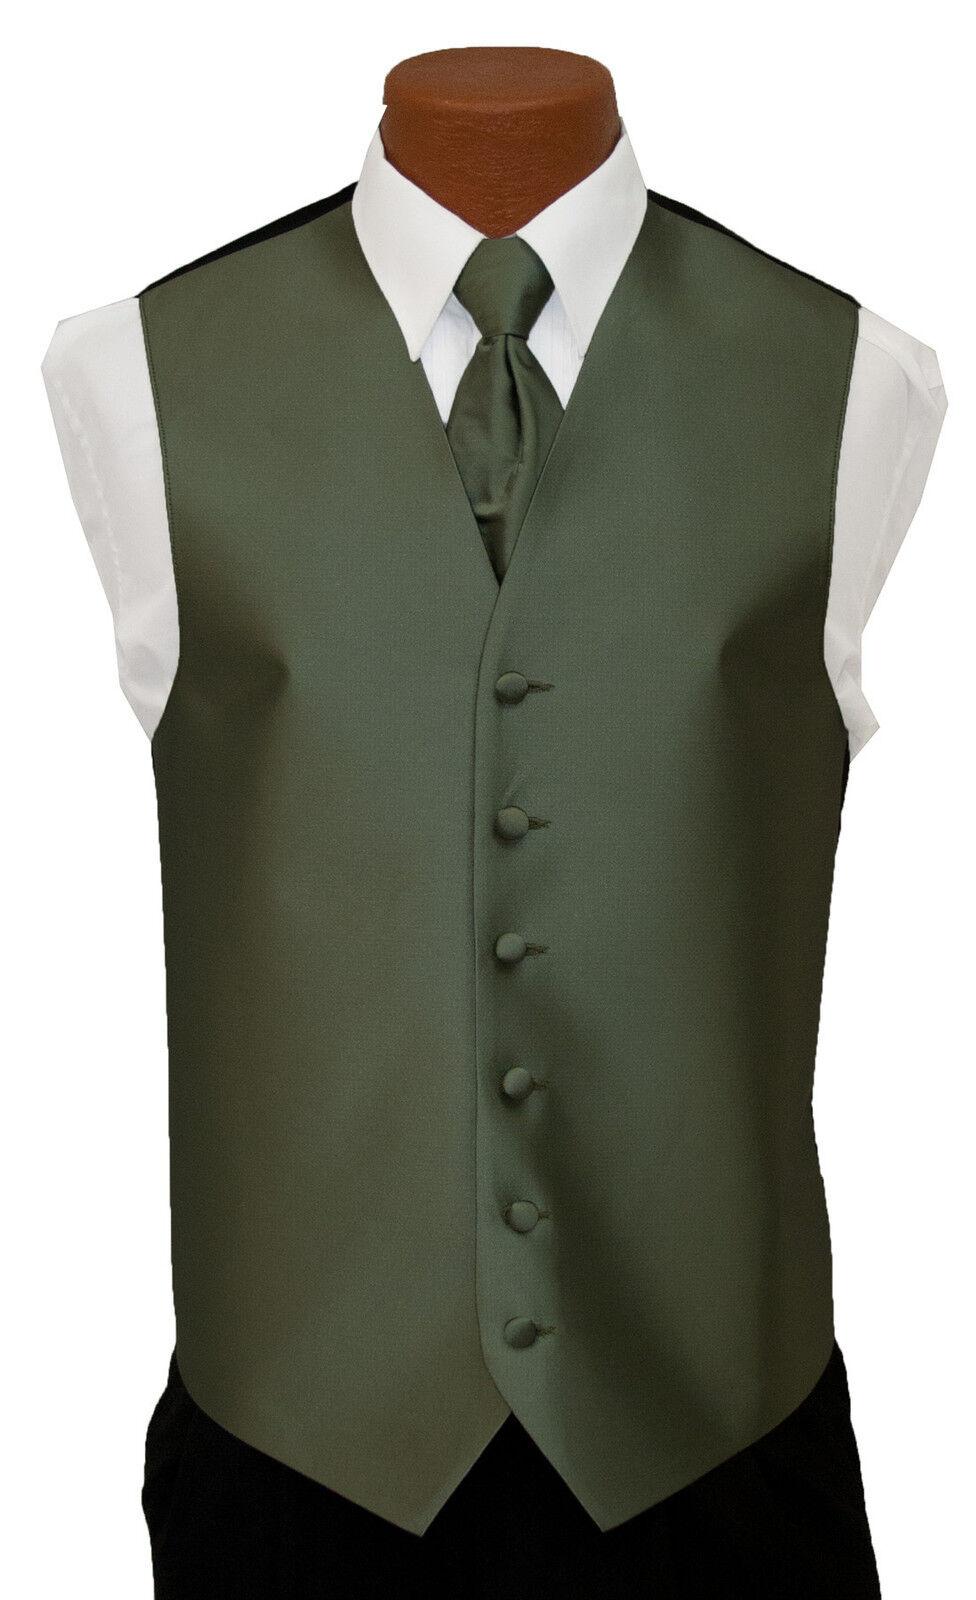 XLarge Long After Six Aries Celedon Green Fullback Wedding Tuxedo Vest Tie Set